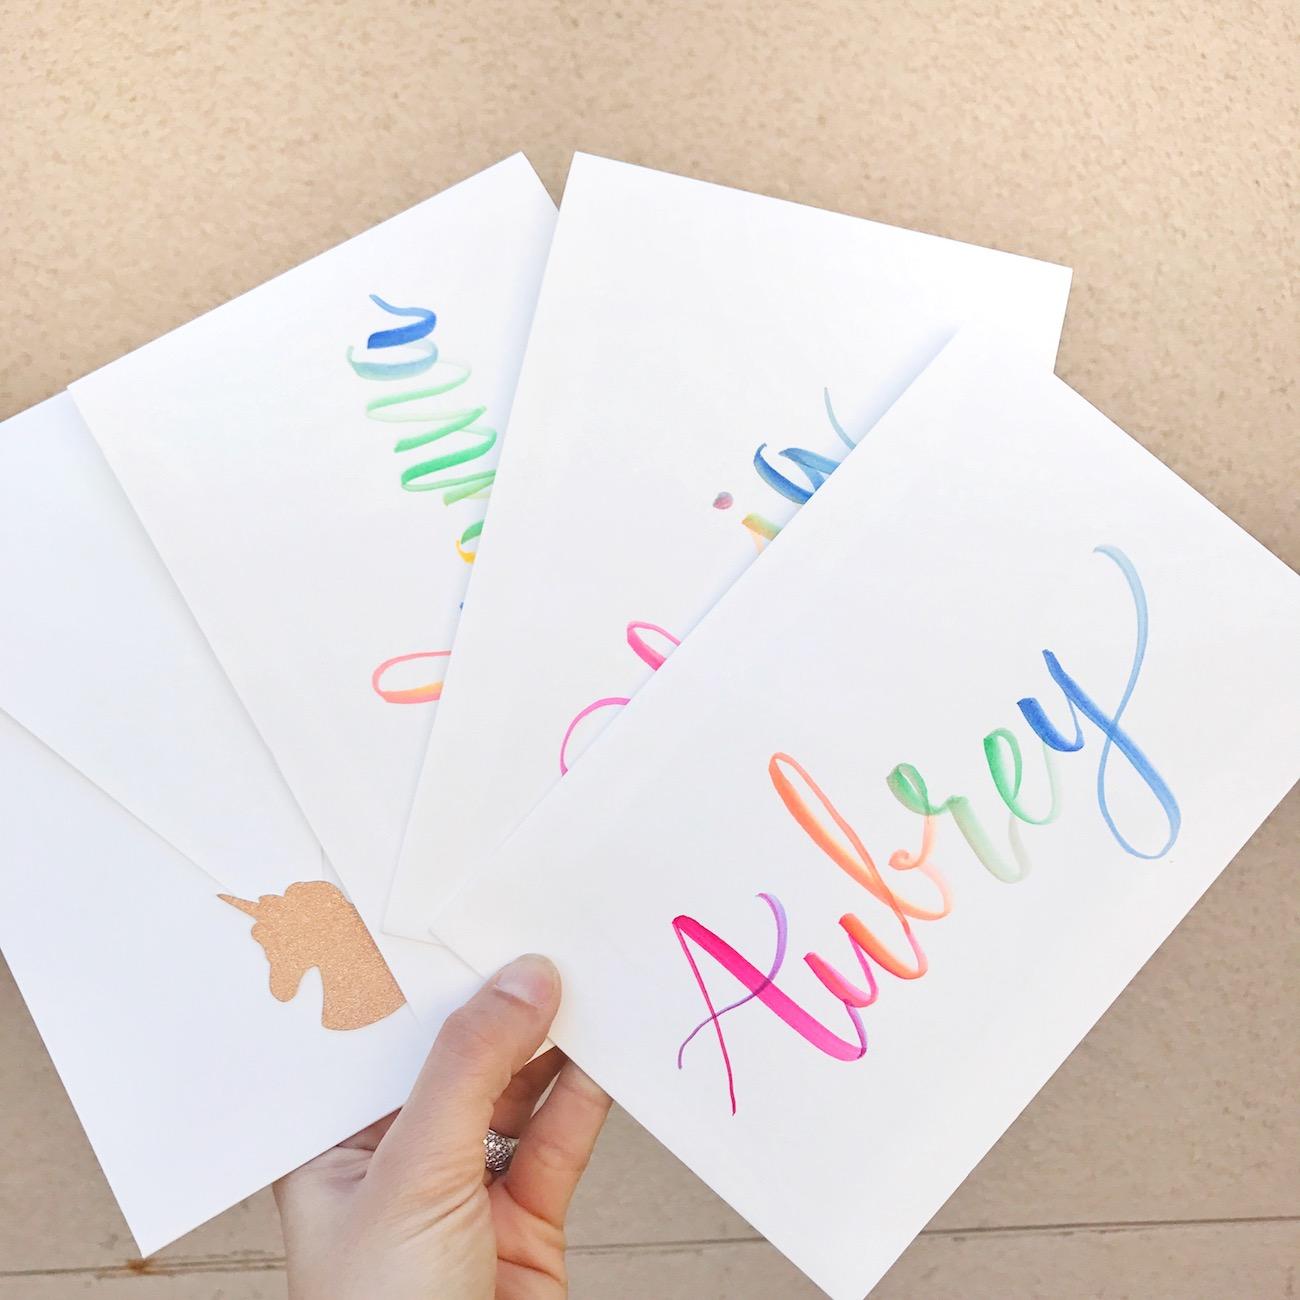 Pences-calligraphy-envelopes.jpg